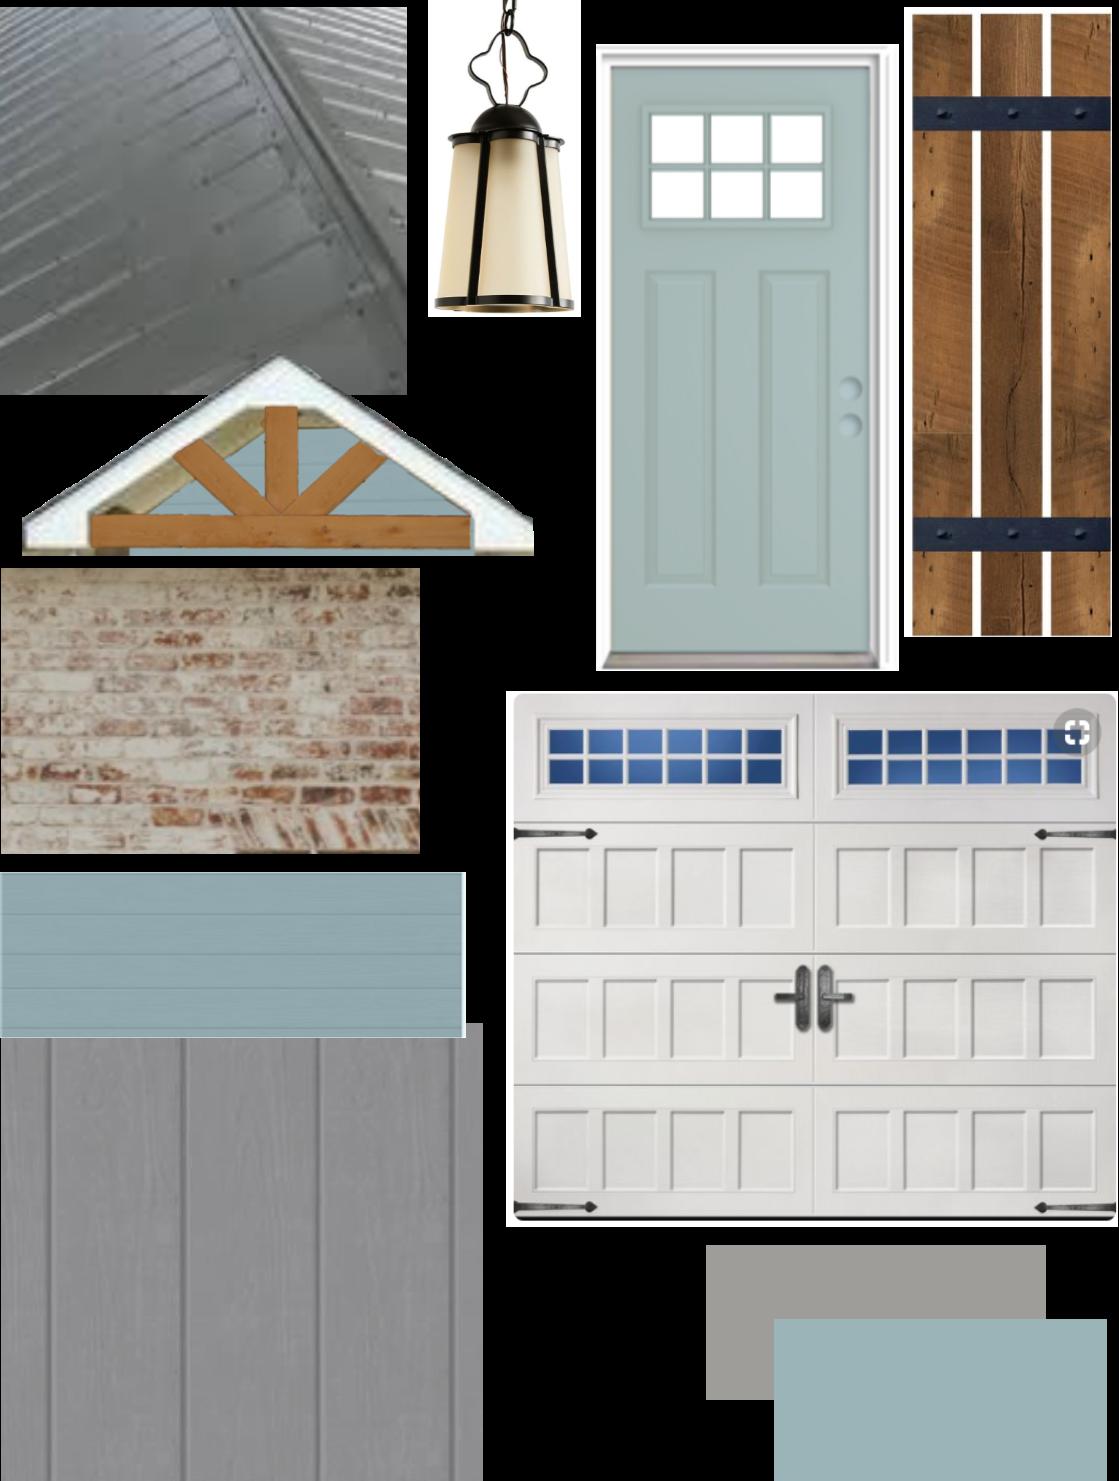 Exterior Palette Tin Roof Schmear Brick Valspar Filtered Shade Gray Behr Harmonious Teal Cr Tin Roof House Farmhouse Exterior Colors Brick Exterior House